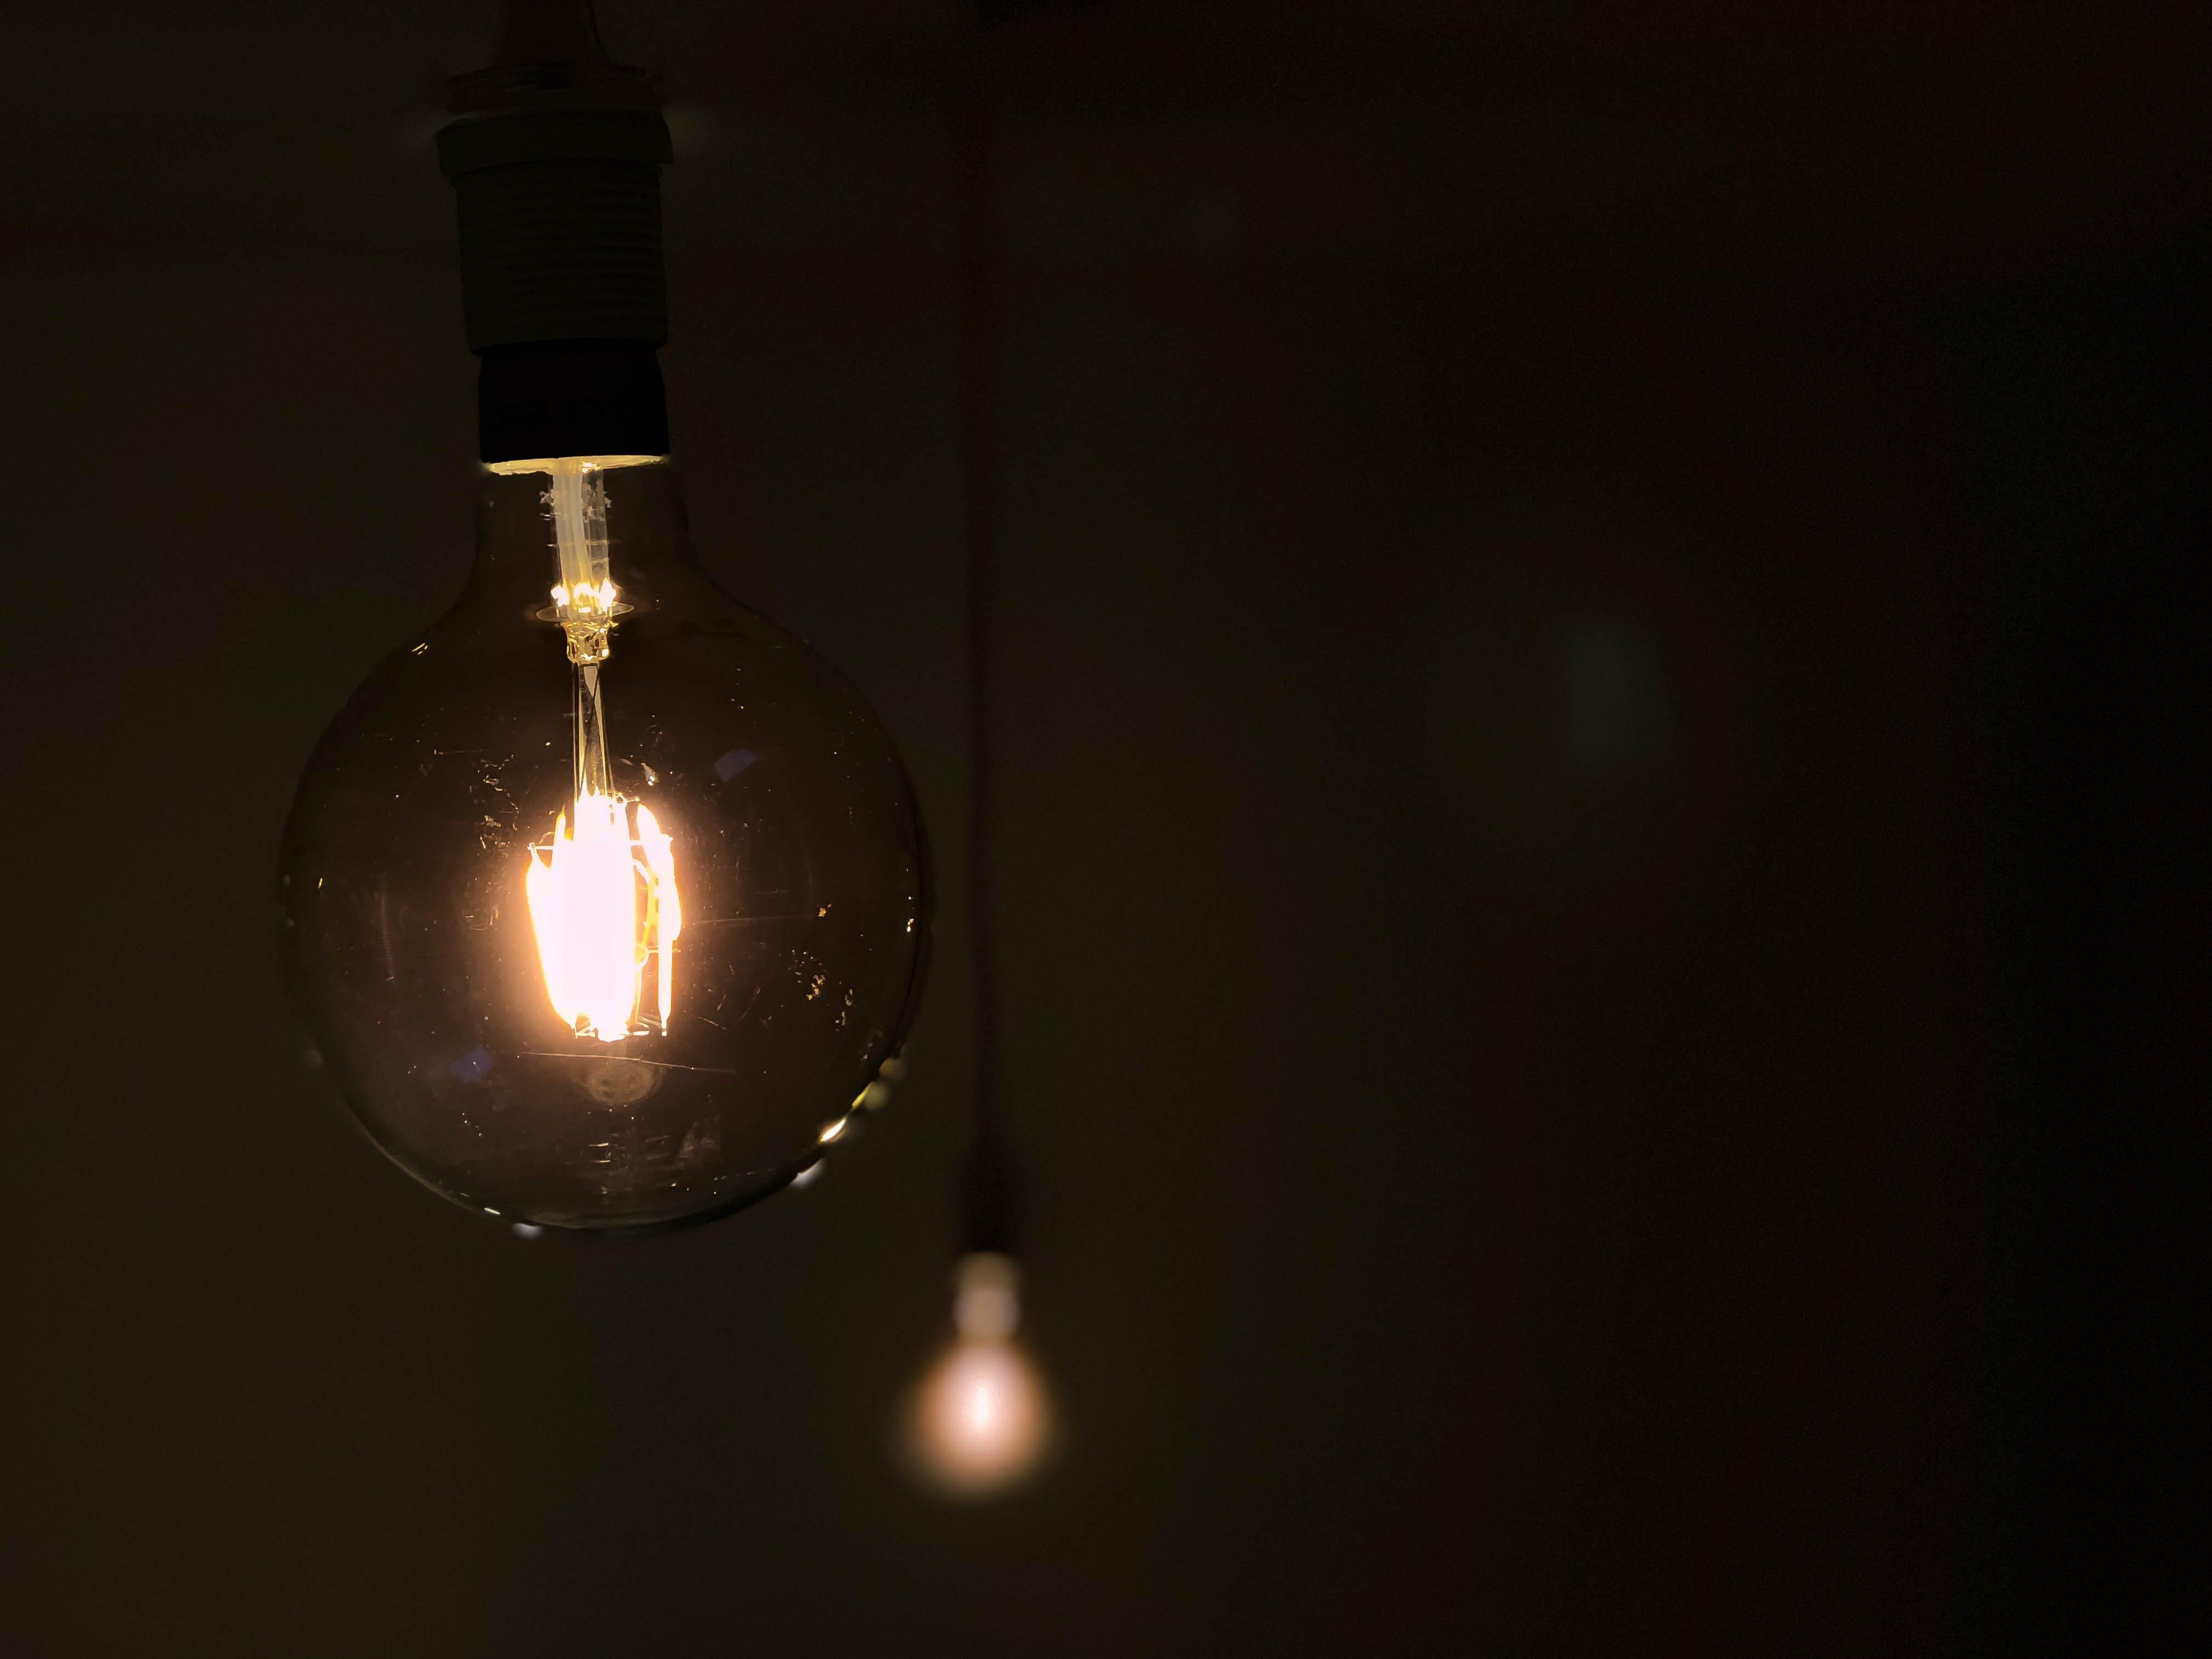 Free stock photo of light, dark, light bulb, rustic